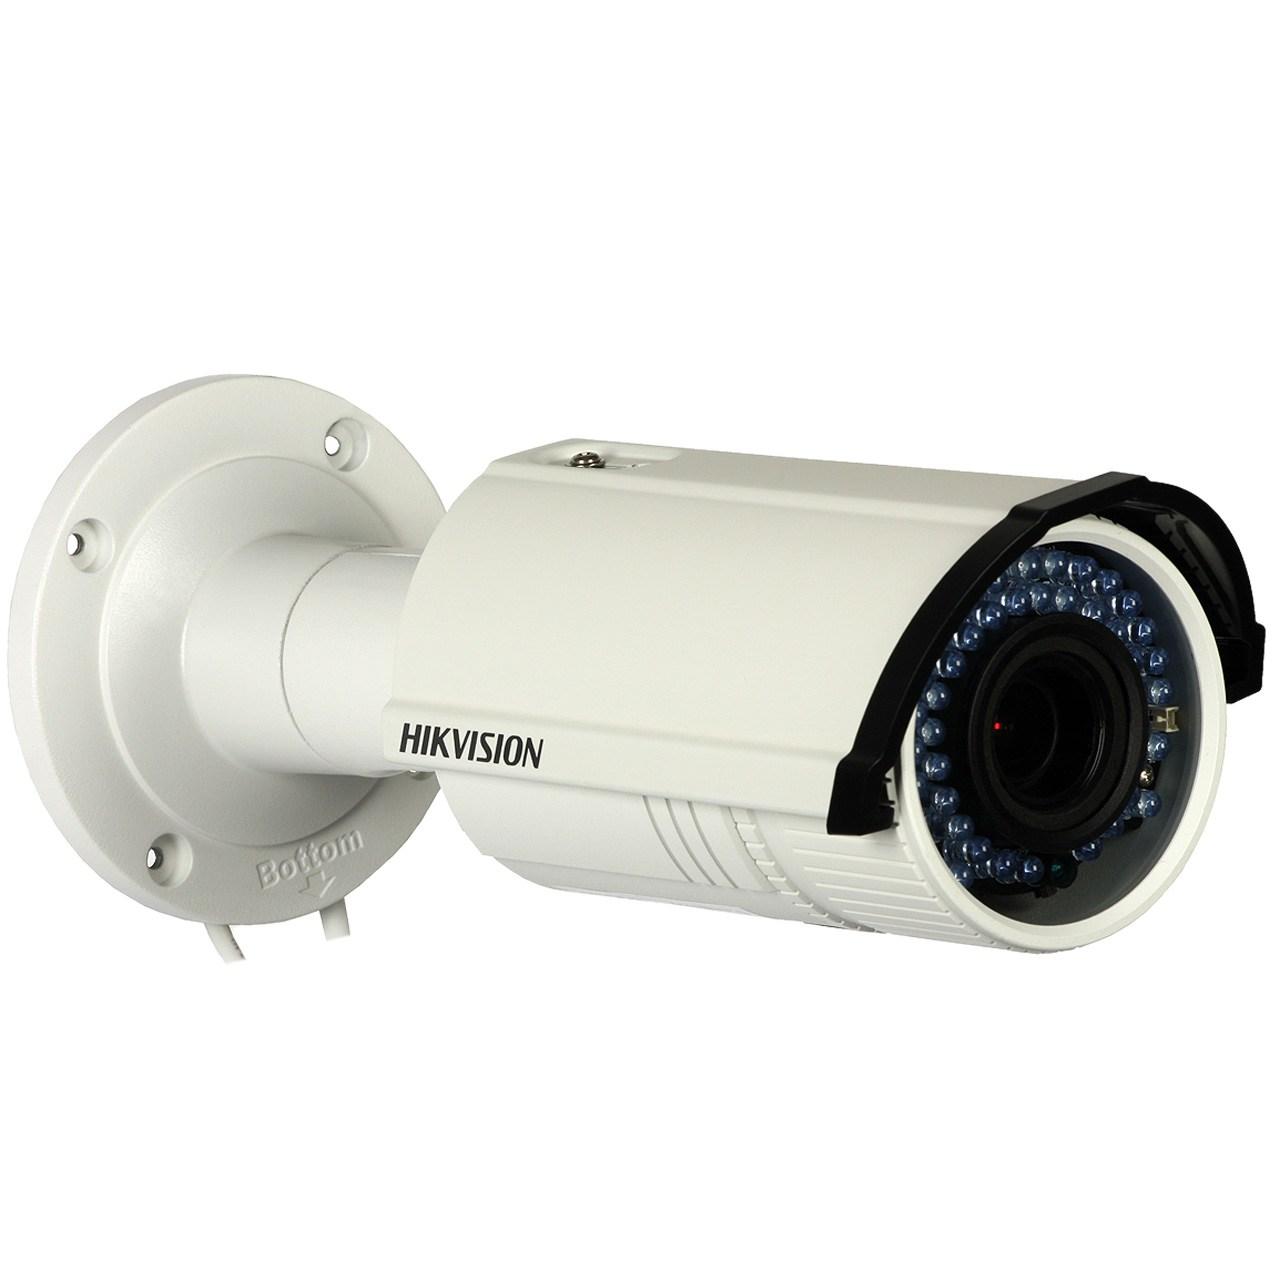 دوربین تحت شبکه هایک ویژن مدل DS-2CD2632F-I